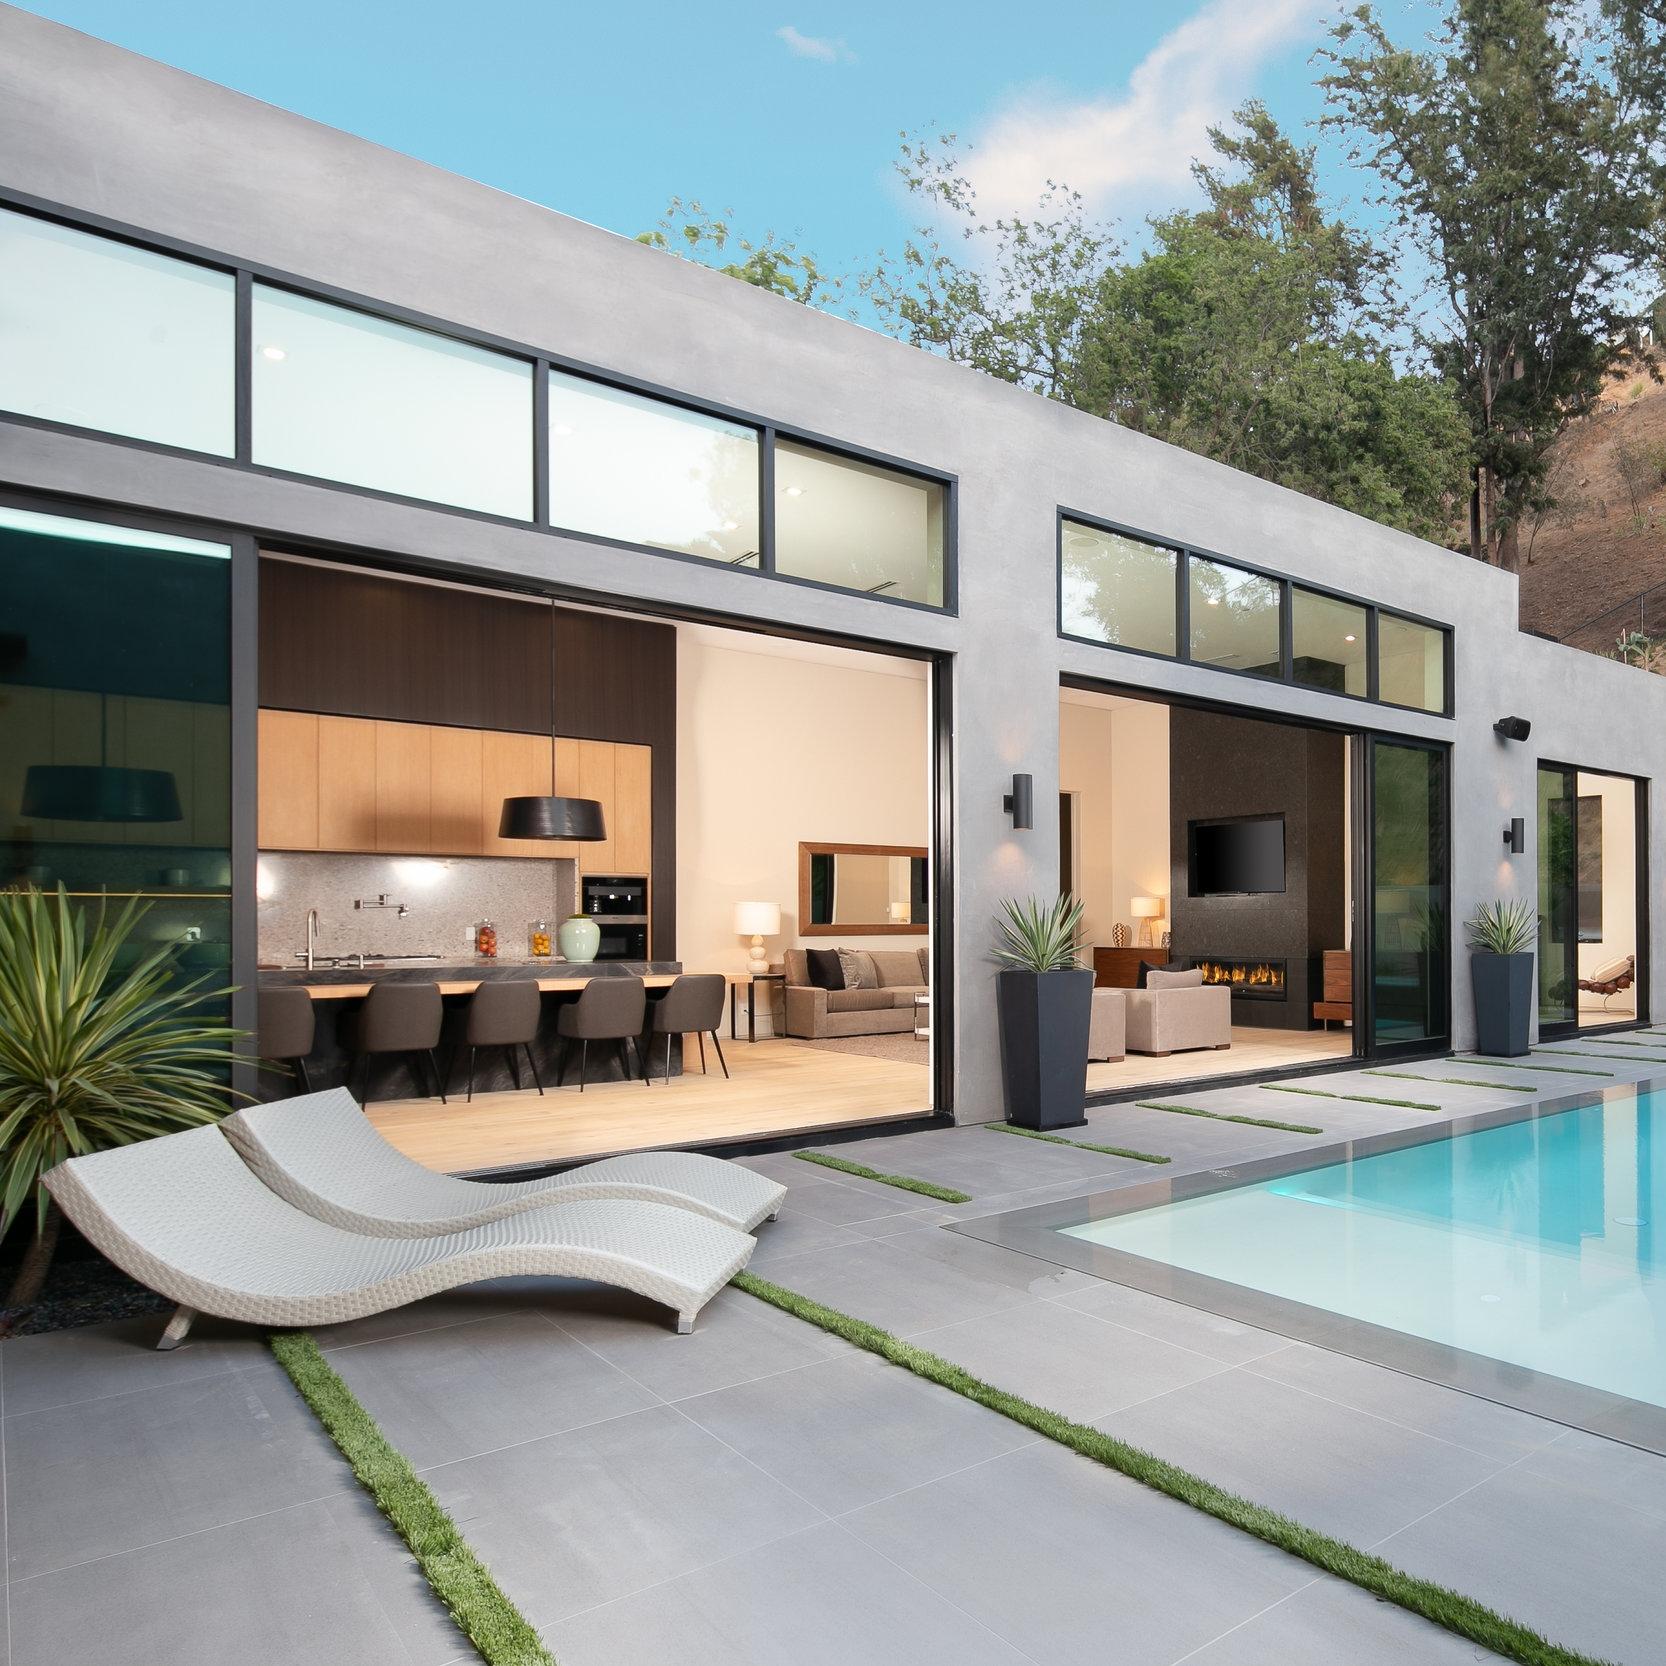 modern-home-new-build-los-angeles.jpg